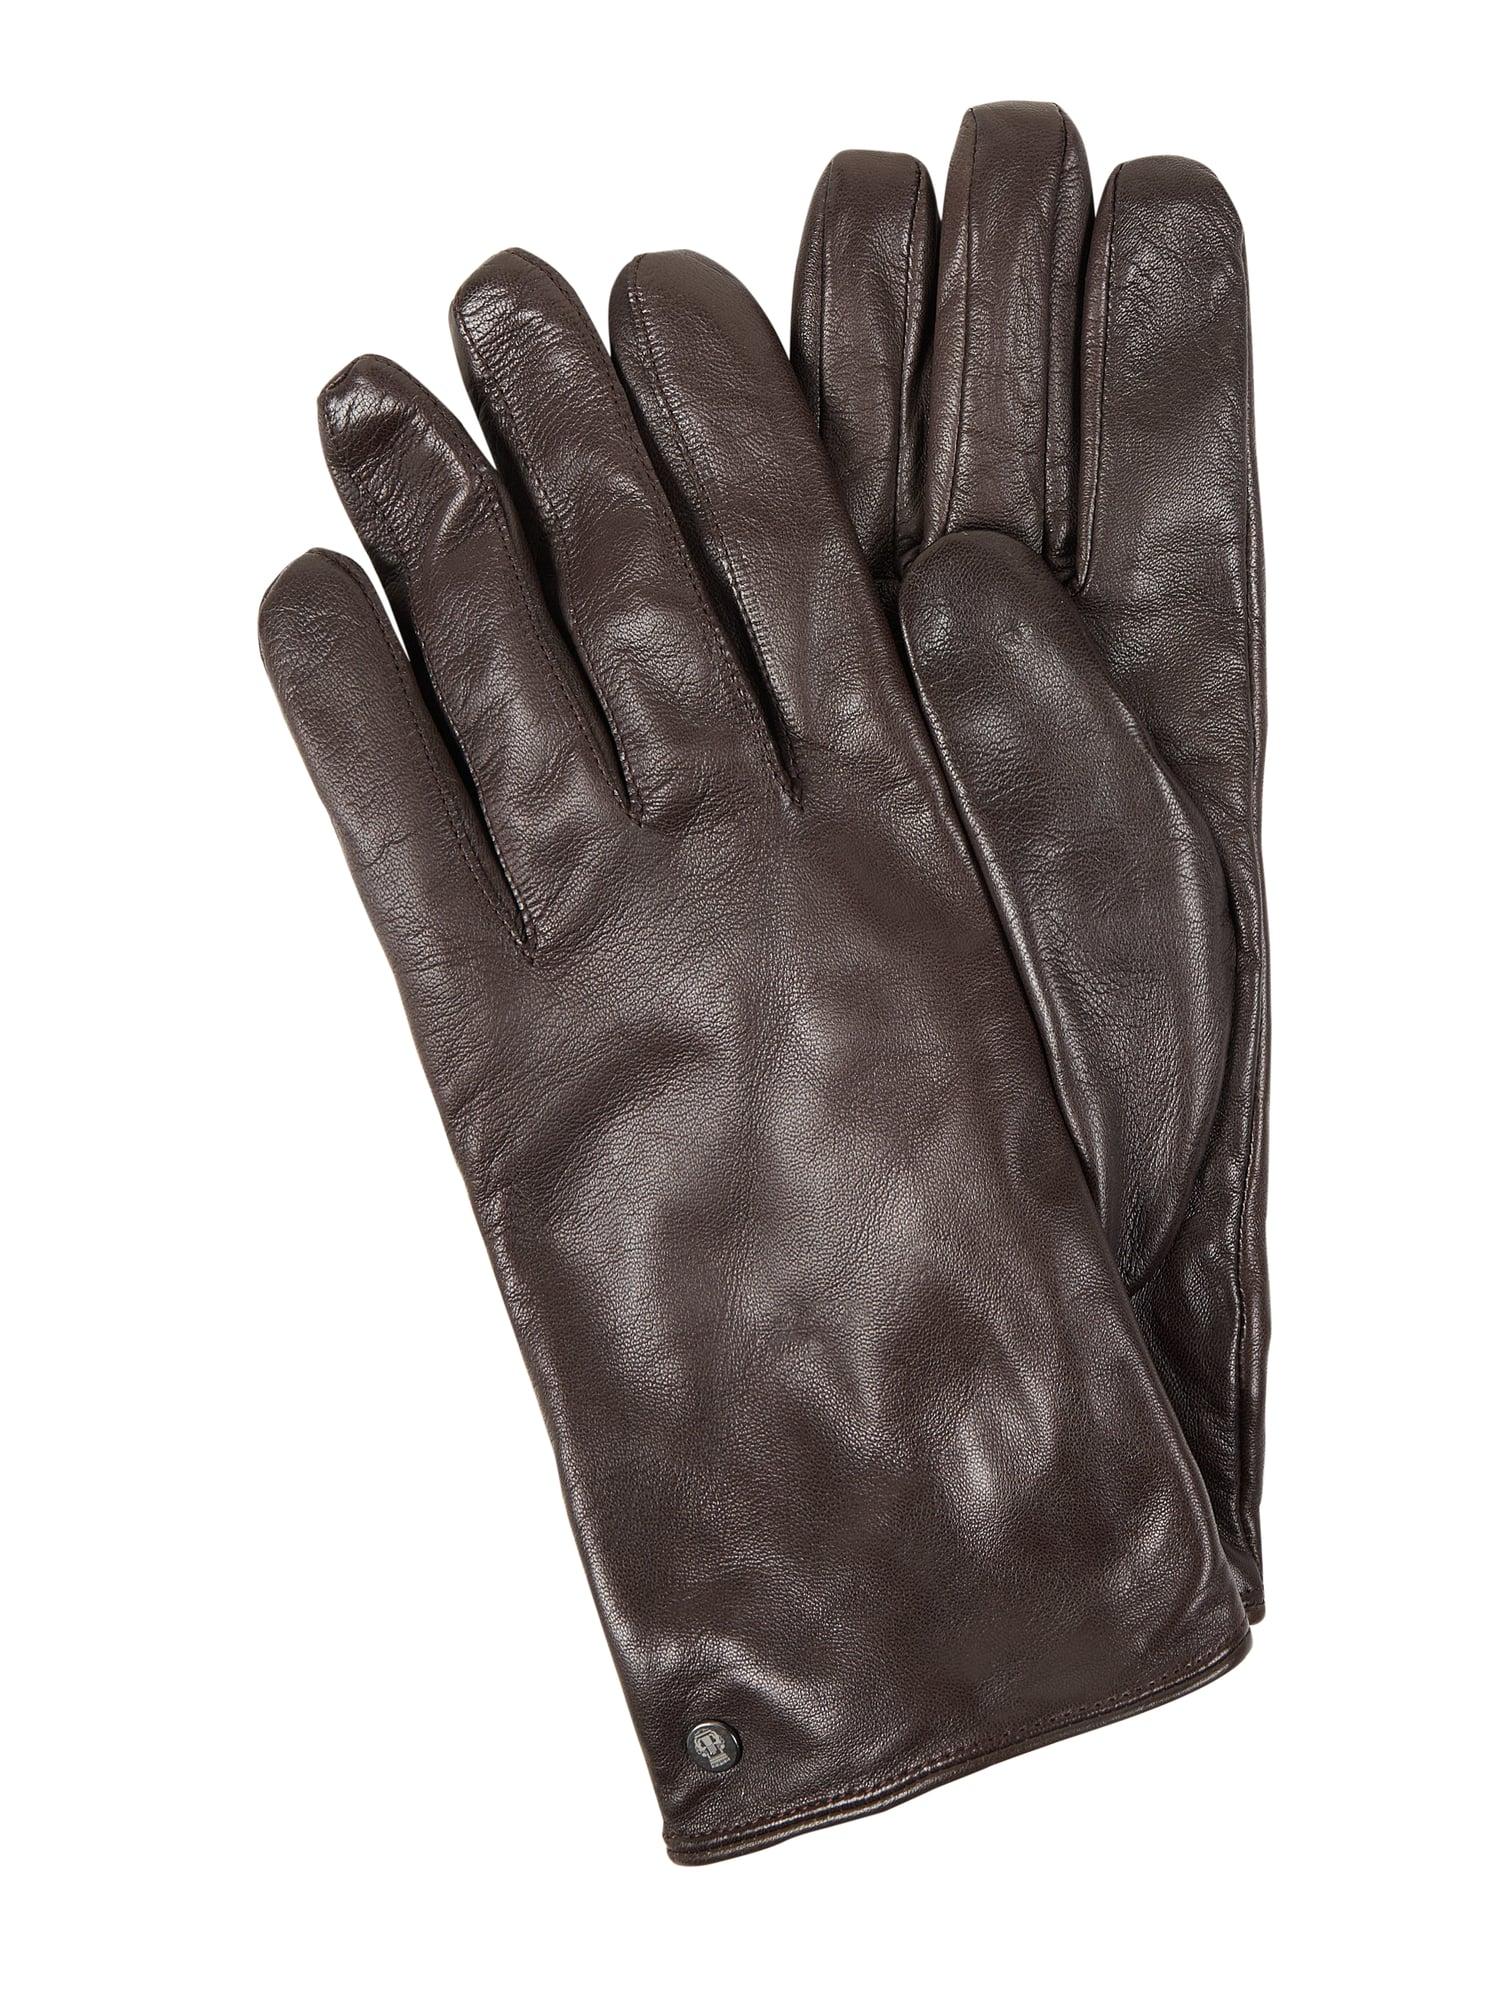 "Roeckl ""Klassiker Fleece"" Leder-Handschuhe (braun oder schwarz) - Rabatt ab 49 €"